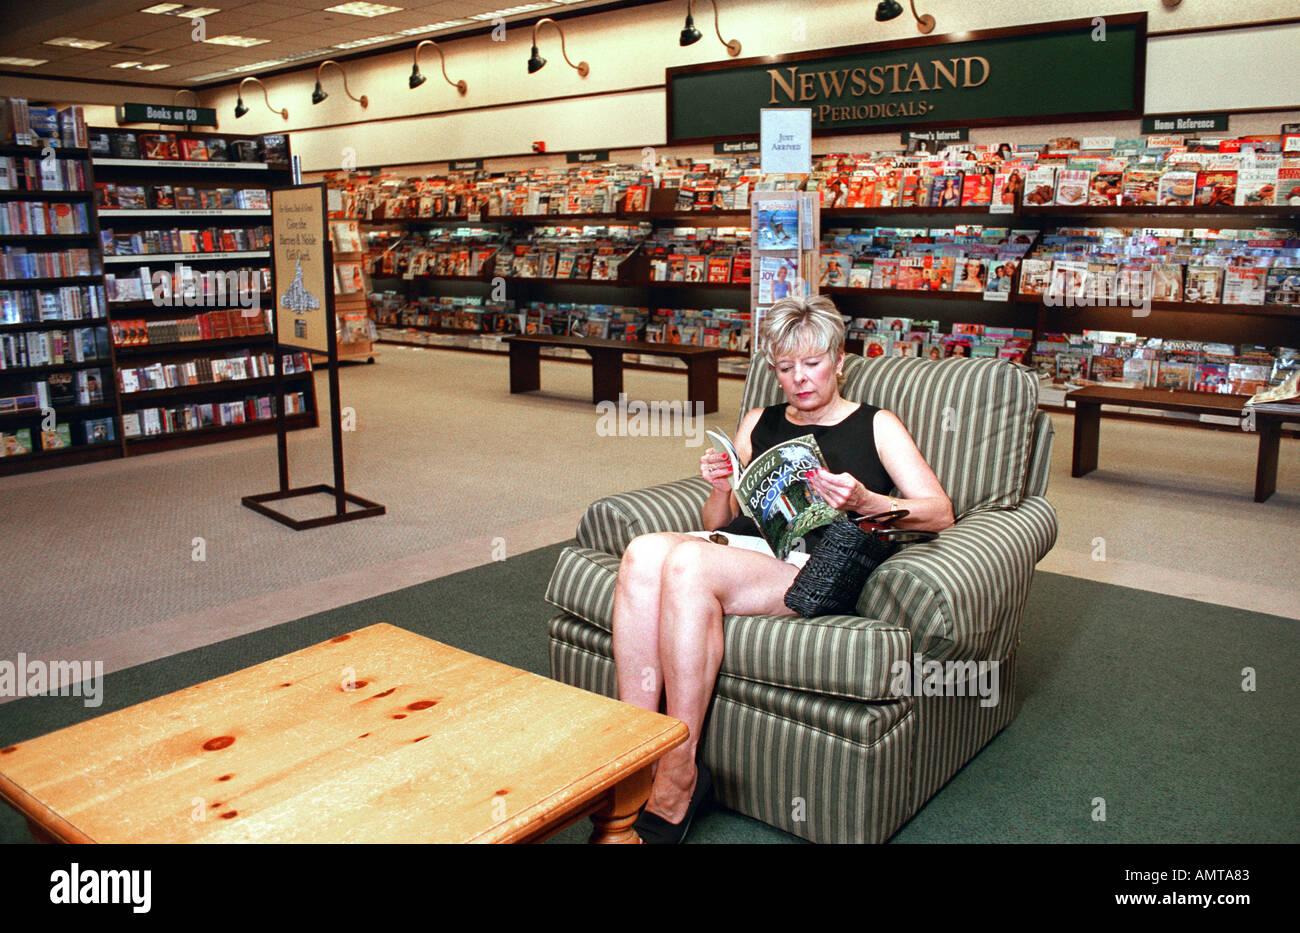 Please Adult book minneapolis store good